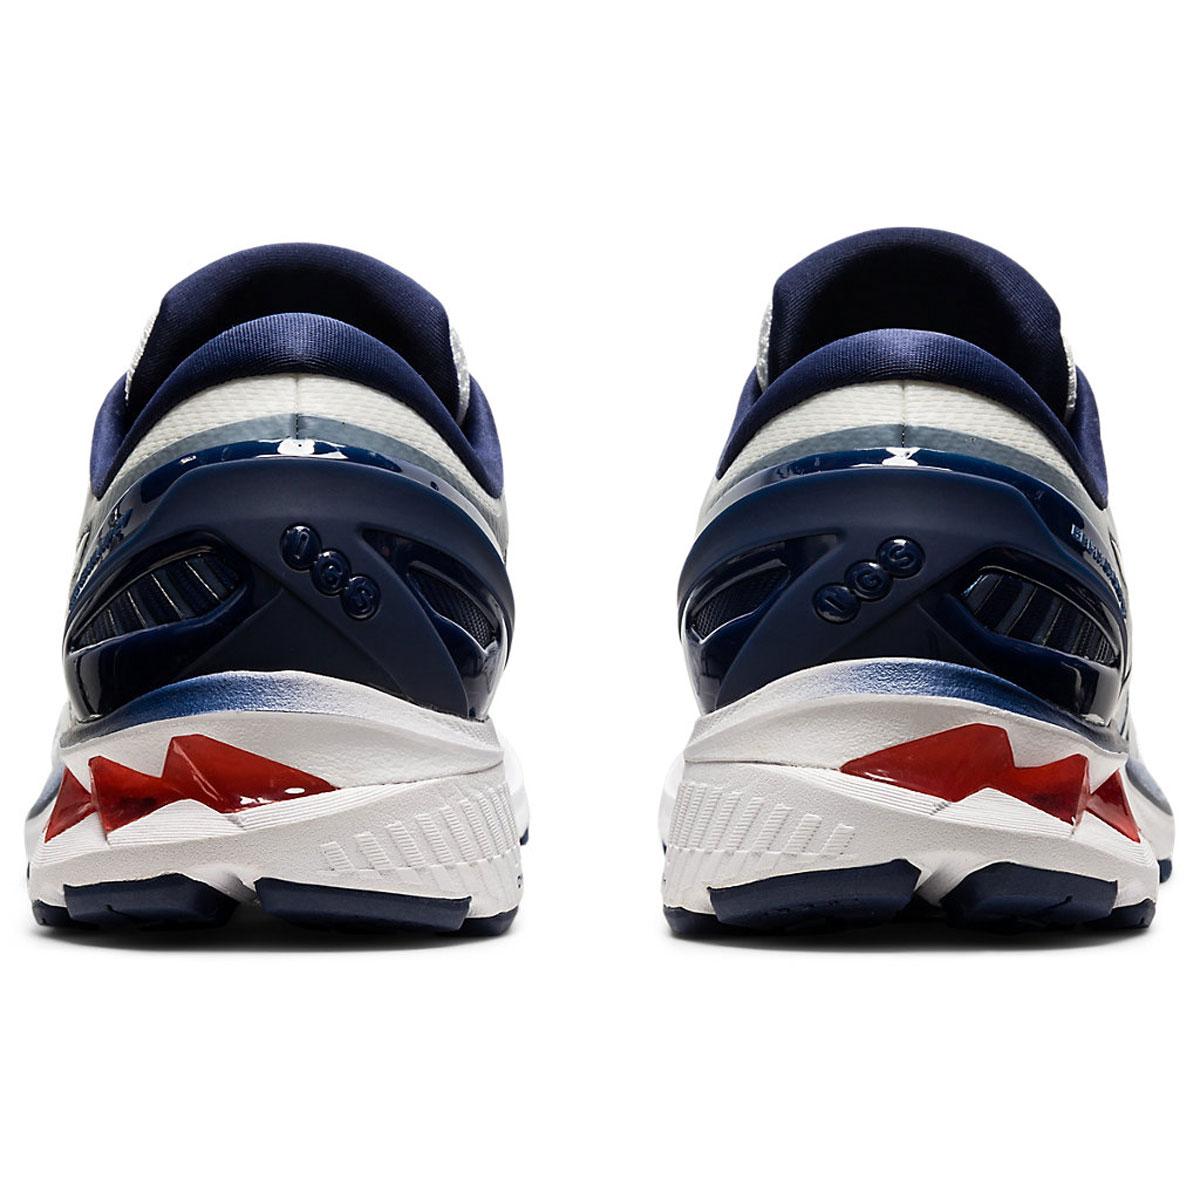 Men's Asics GEL-Kayano 27 Running Shoe - Color: White/Peacoat (Regular Width) - Size: 6, White/Peacoat, large, image 5